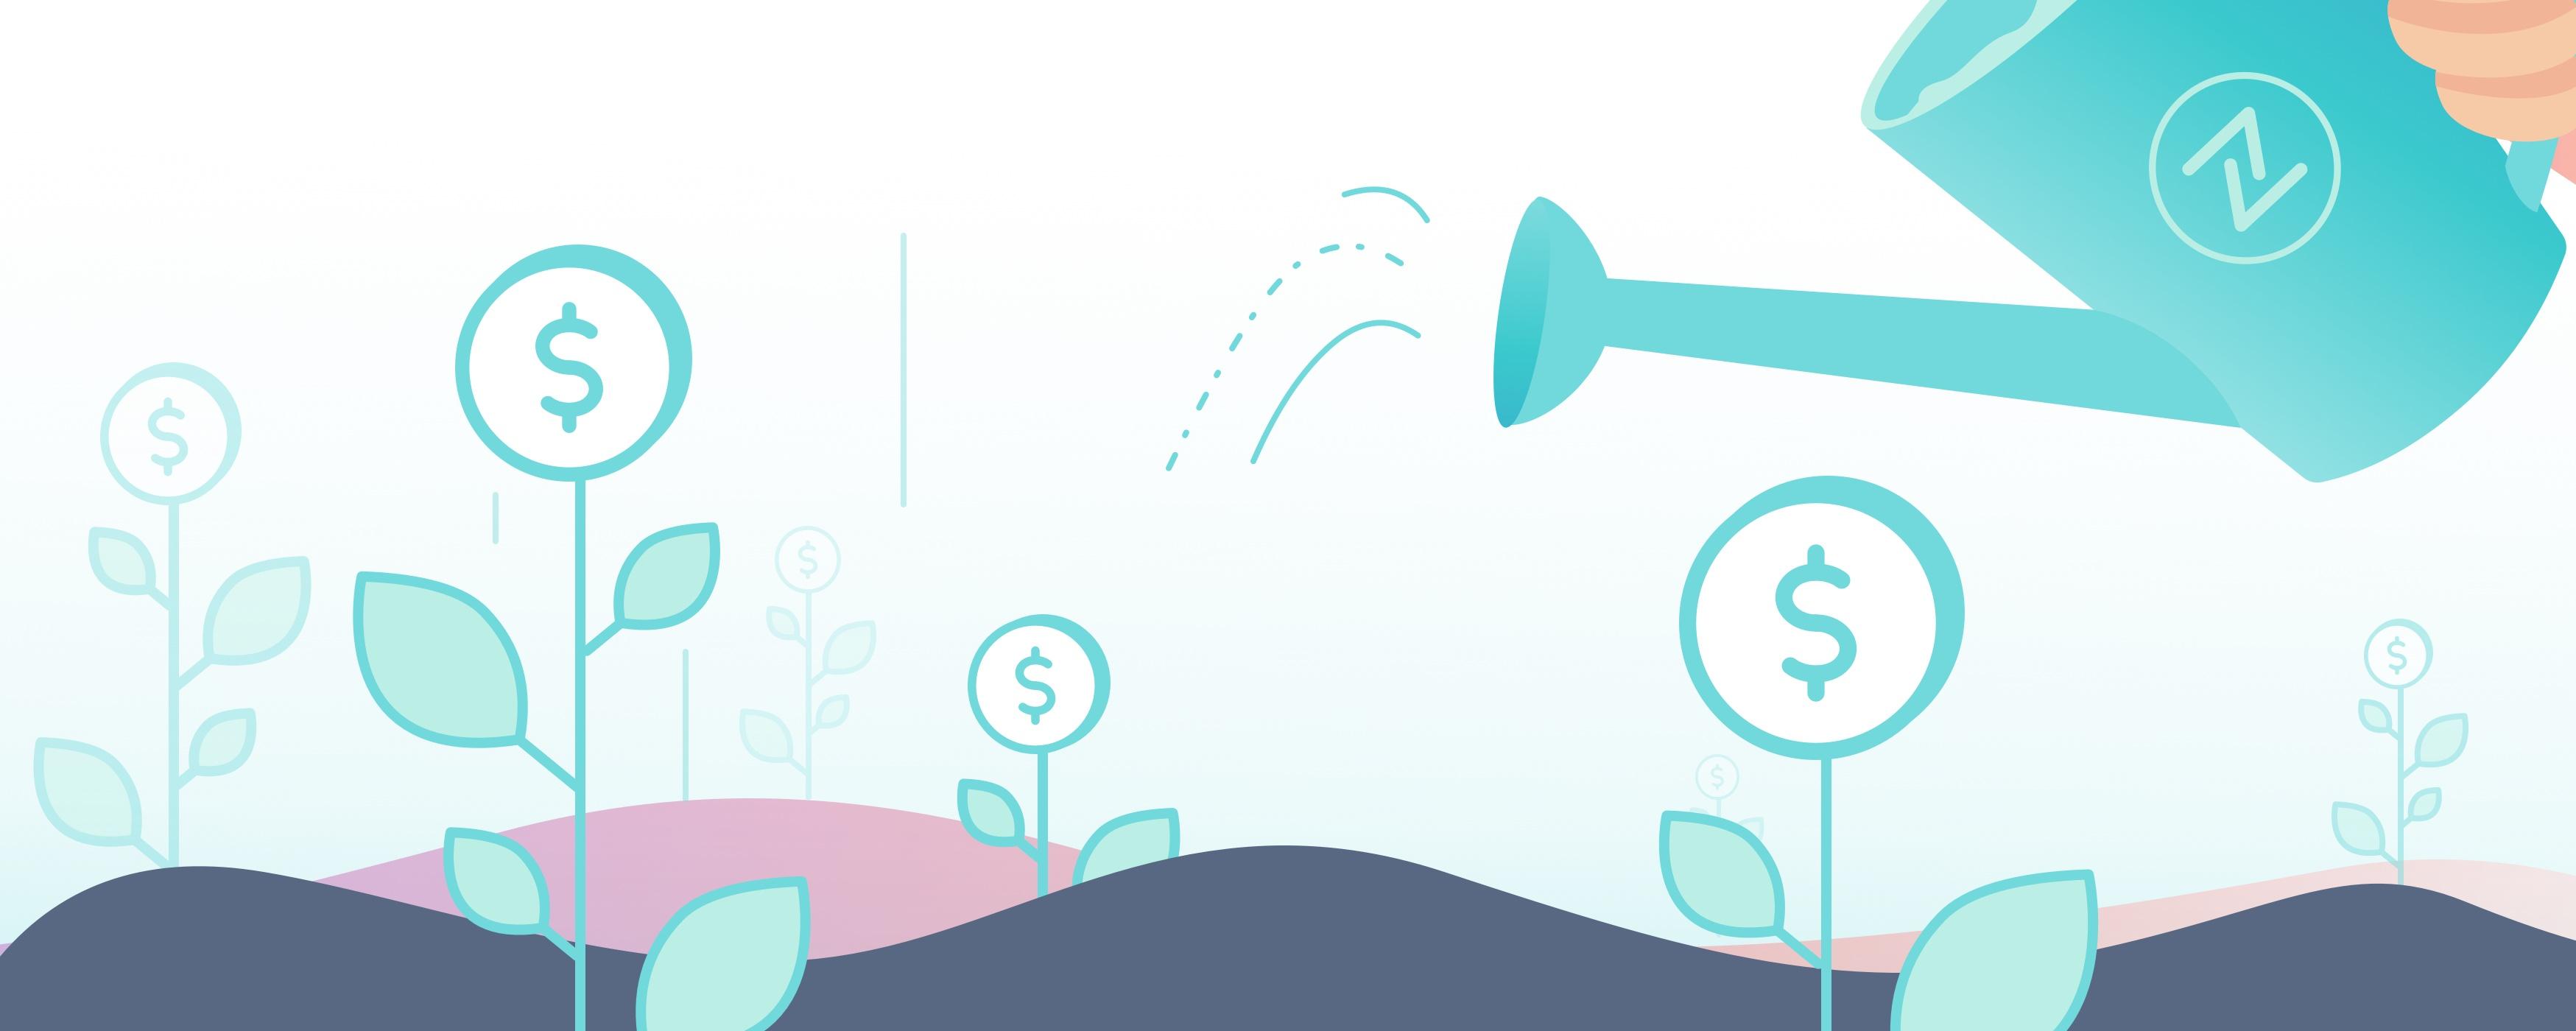 growth-marketing-tips-webinar-LP.jpg